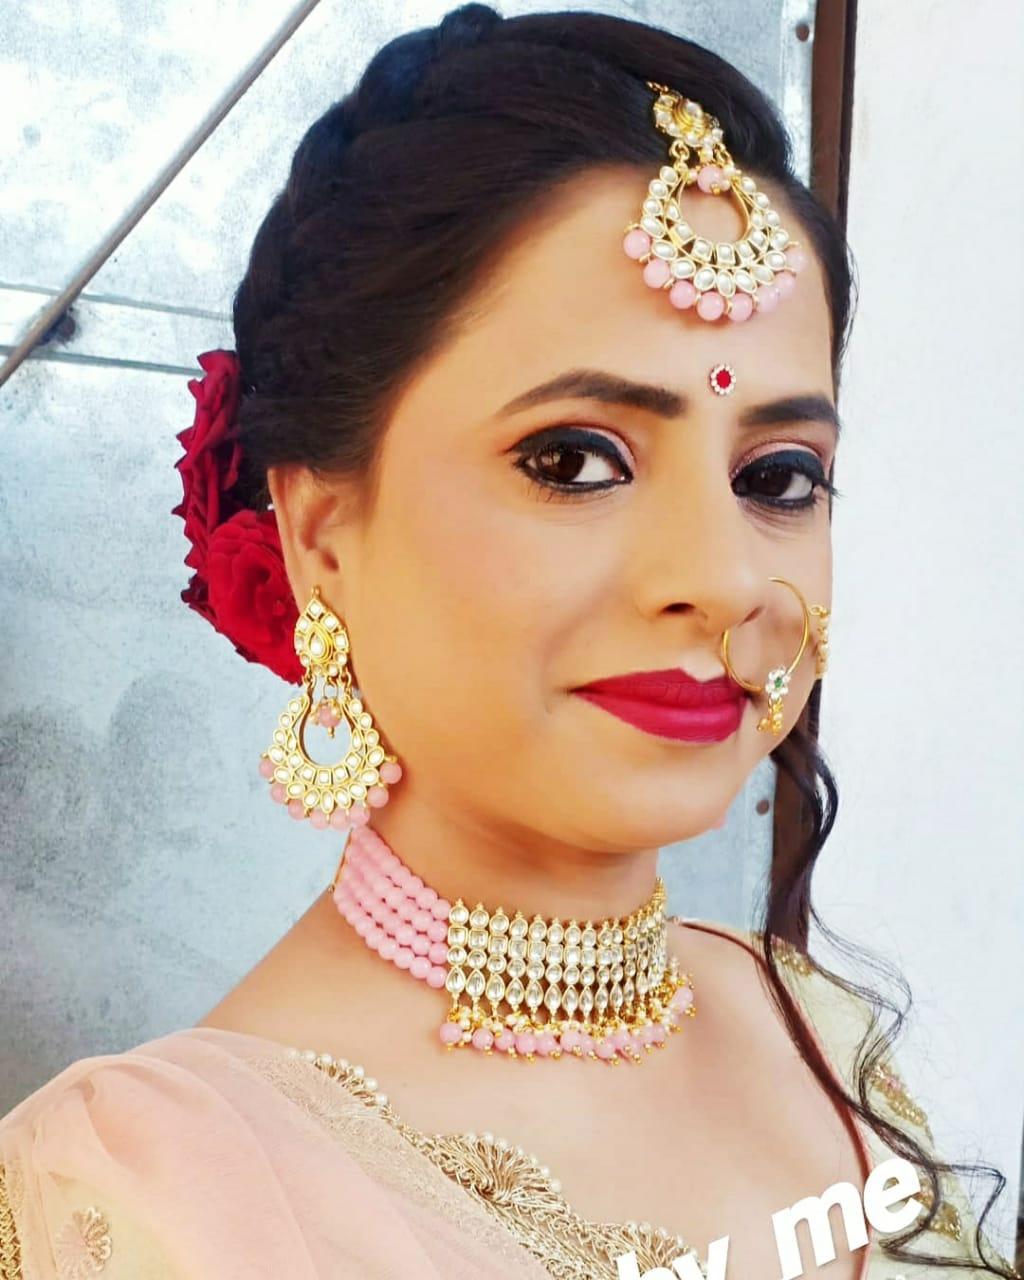 deepika-saini-makeup-artist-jaipur